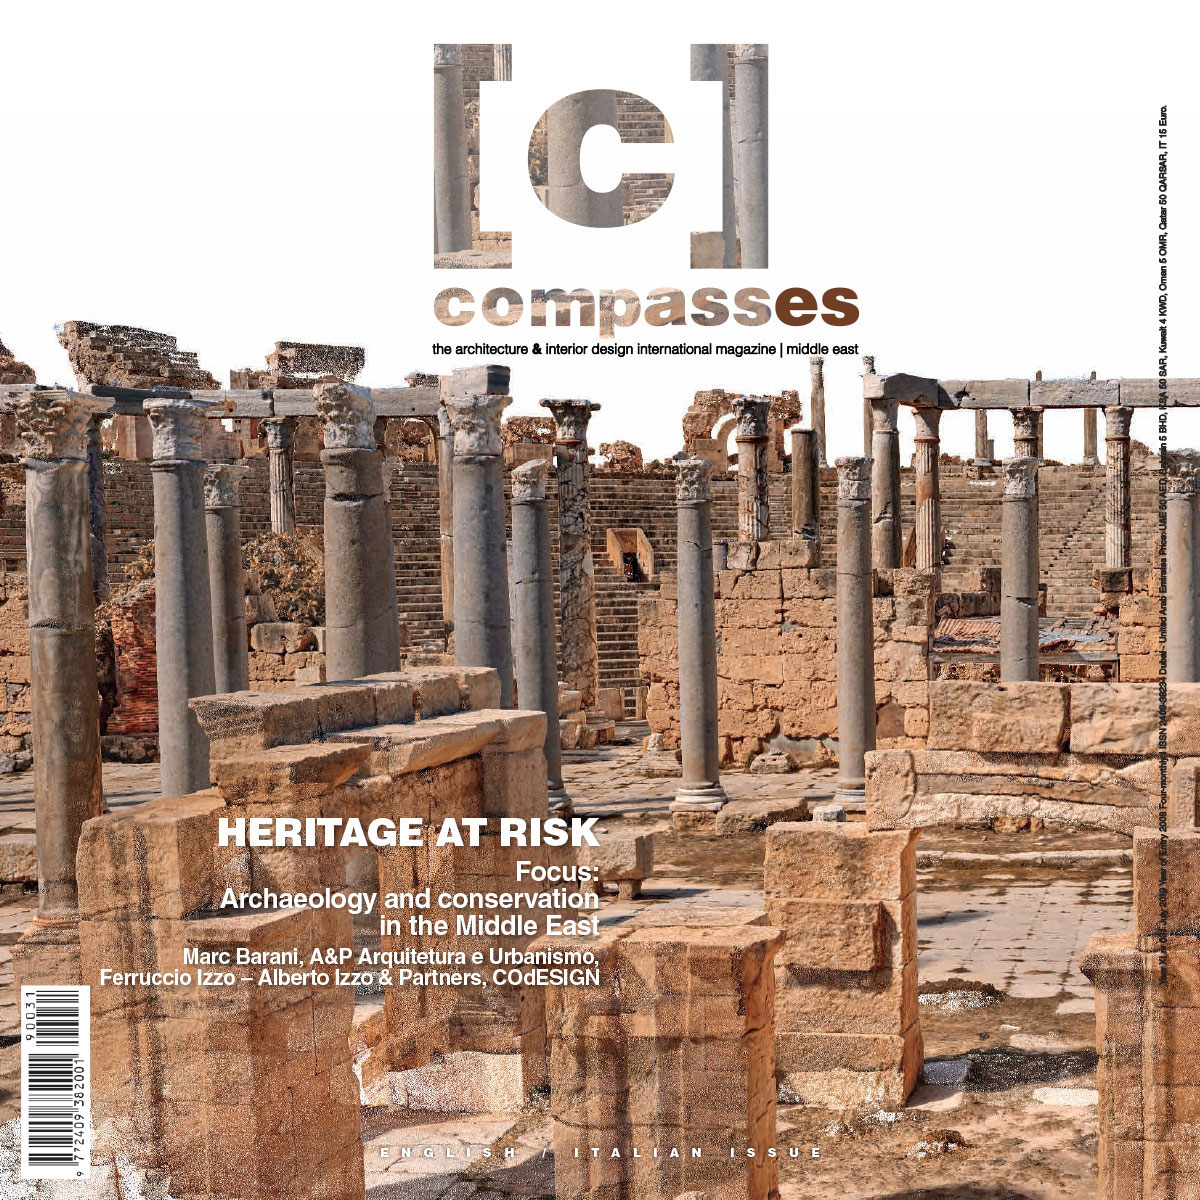 The Magazine Compasses Magazine The Architecture Interior Design International Network Middle East